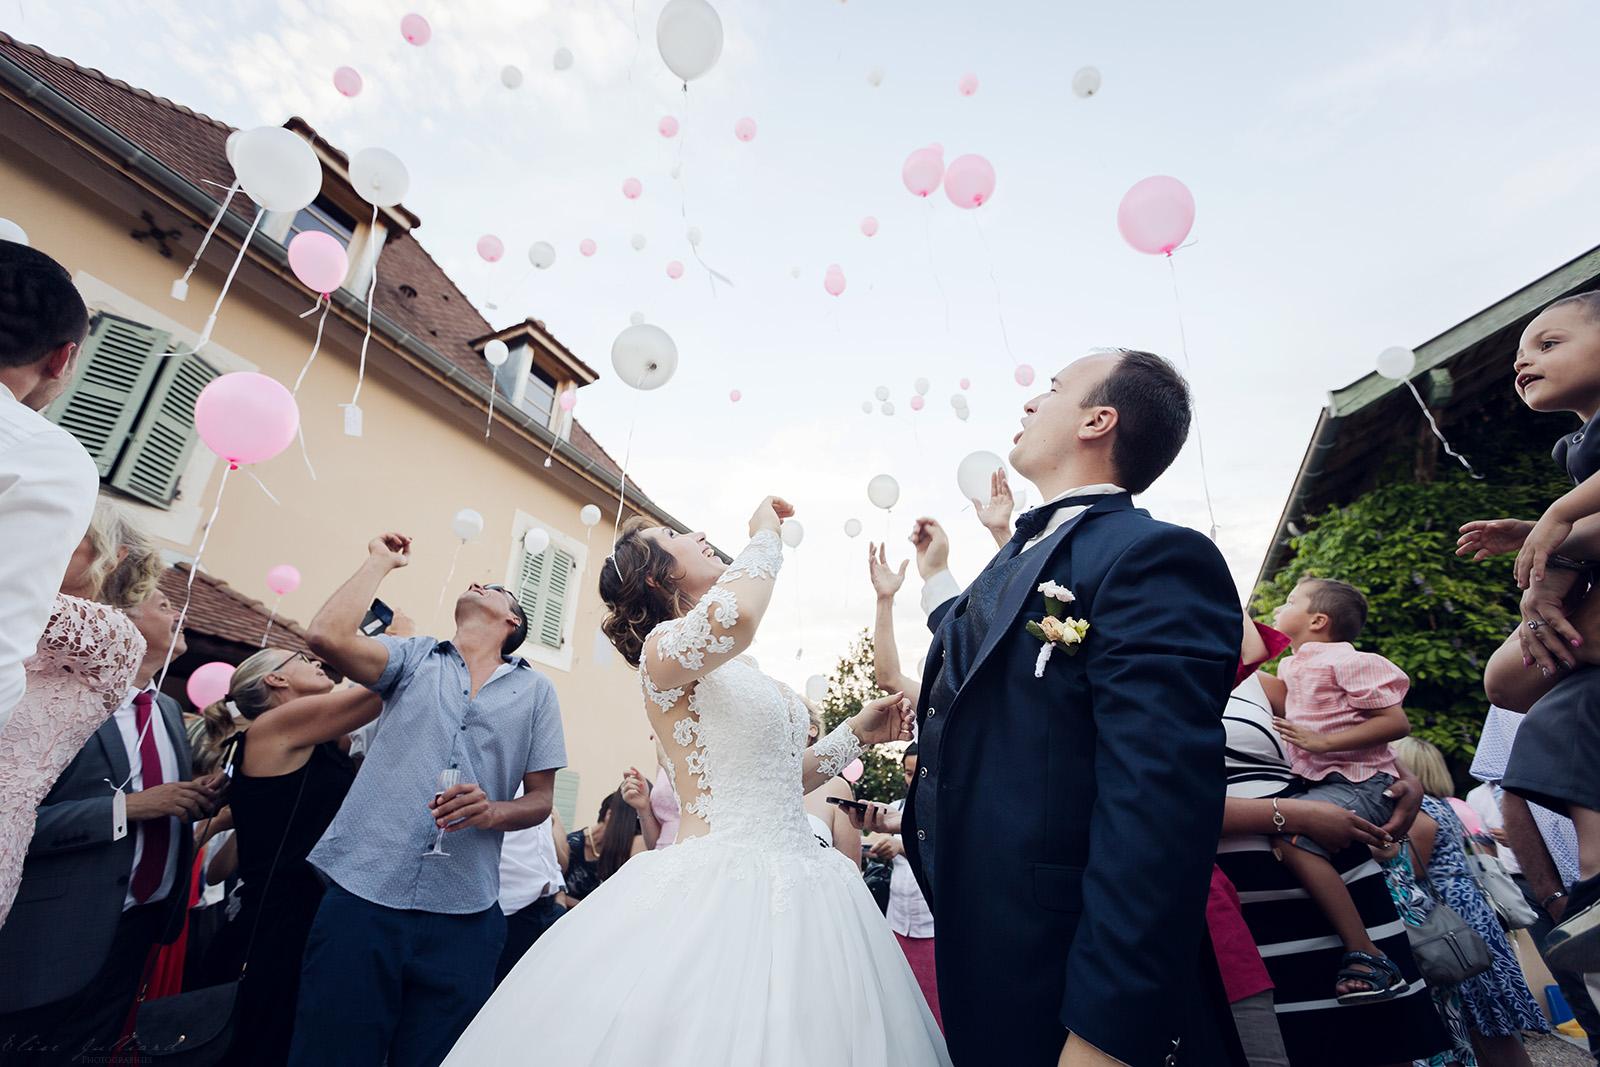 mariage-photographe-elise-julliard-wedding-reportage-love-session-domaine-de-suzel-auvergne-rhone-alpes-lyon-bourgoin-jallieu-seance-photo-couple-preparatifs-8